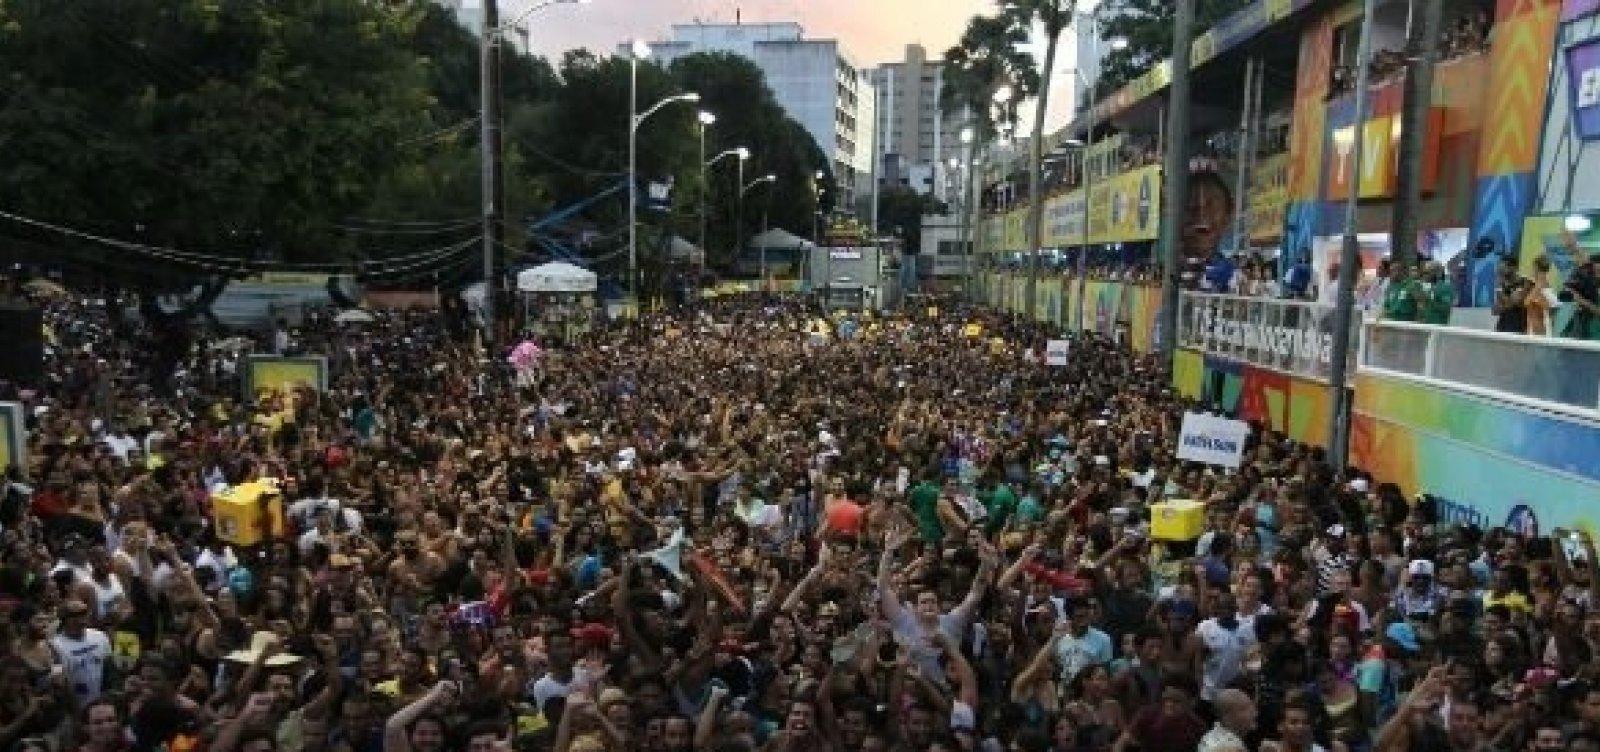 Advogado baiano Otto Pipolo lança livro sobre funcionamento das leis no Carnaval